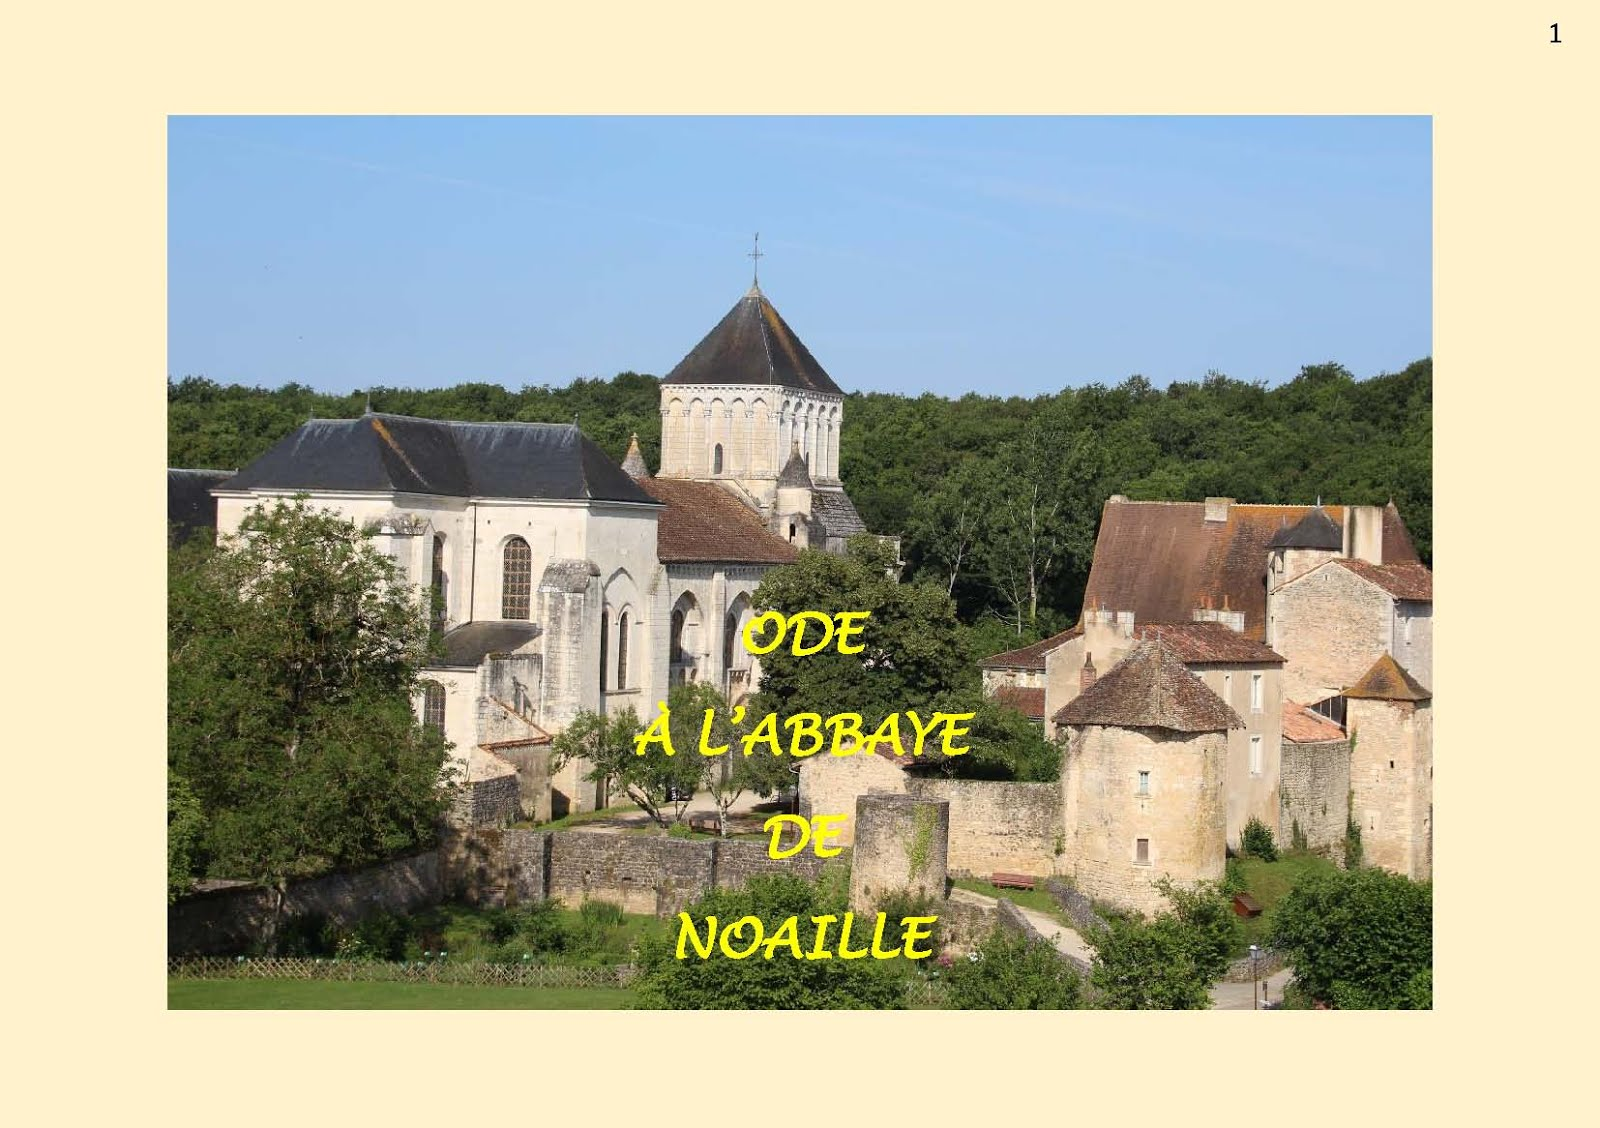 Ode à l'abbaye de Noaille